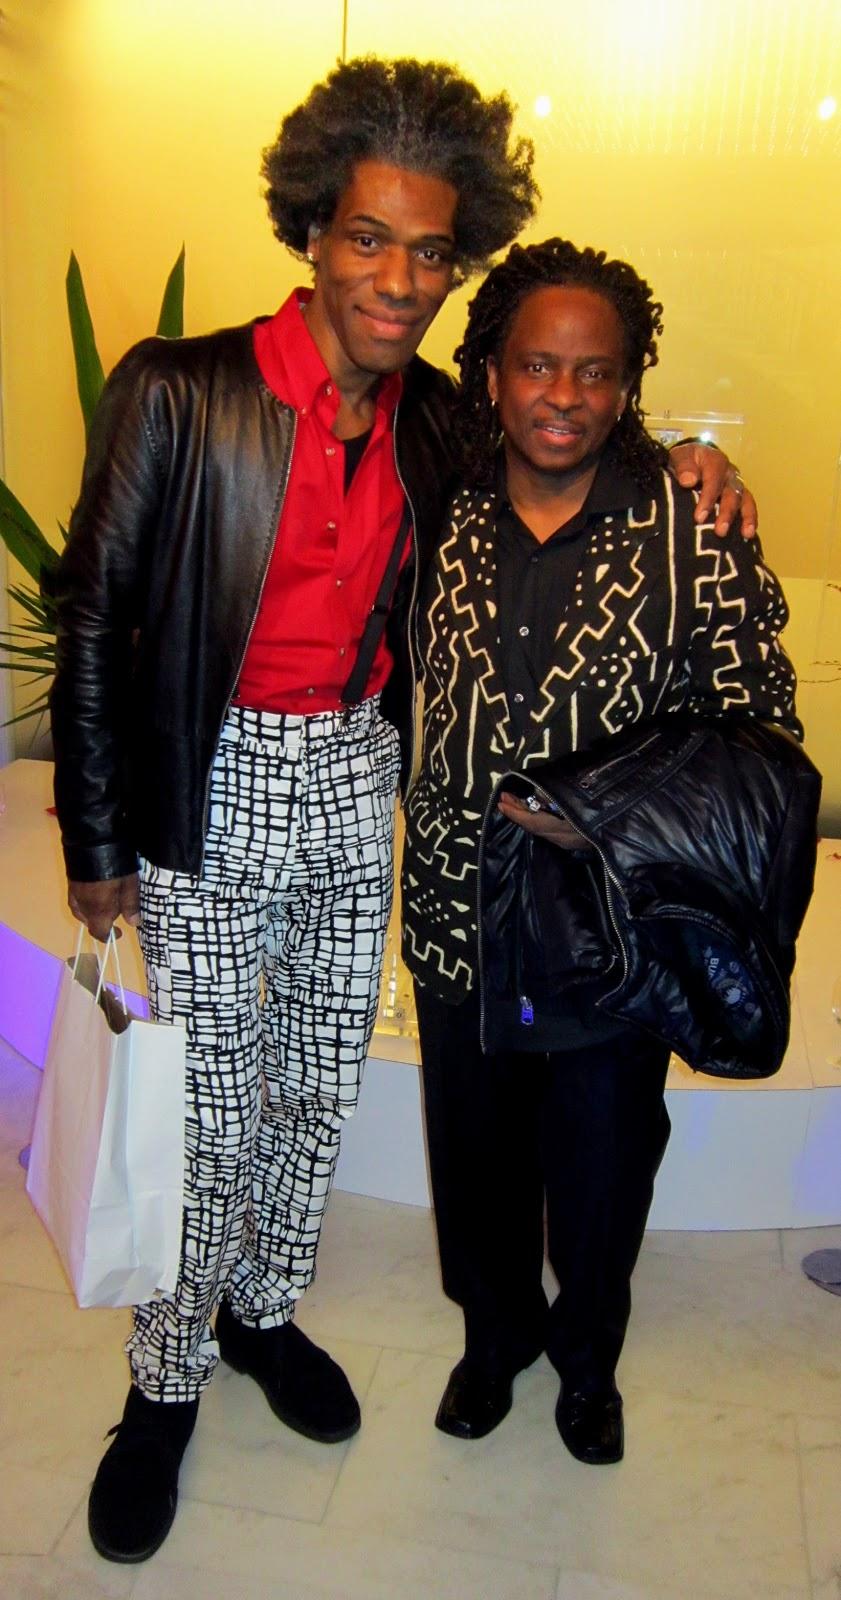 Minnie Driver (born 1970 (naturalized American citizen),Susan Seaforth Hayes born July 11, 1943 (age 75) Adult photos Victoria Azarenka 2 Grand Slam singles titles,Victor Maddern (1928?993)